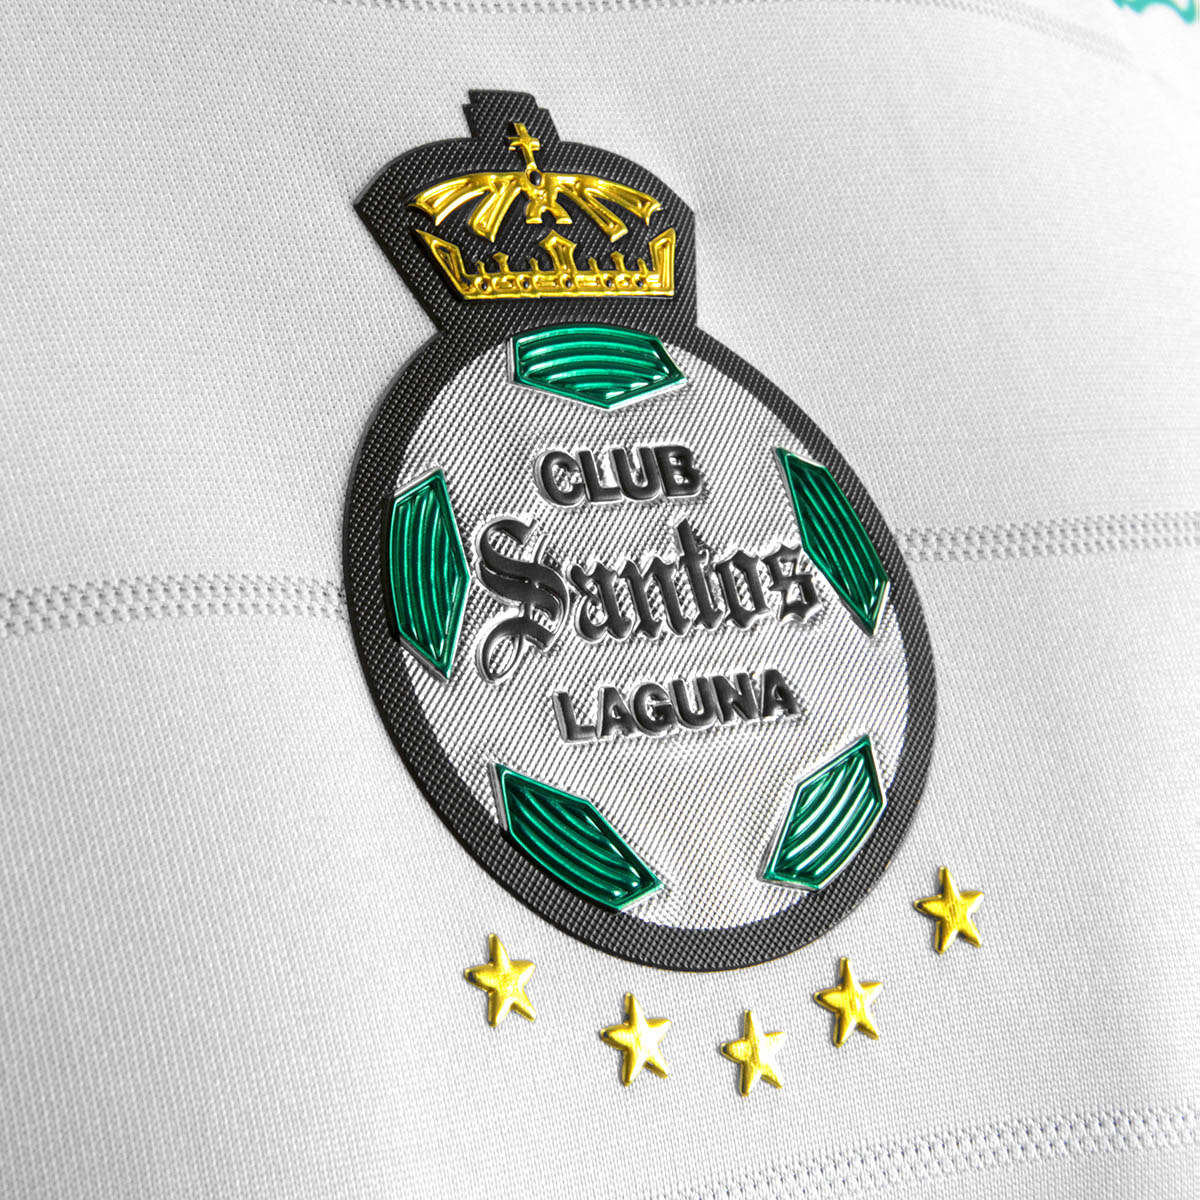 Santos Laguna 2016 Third Kit Released - Footy Headlines